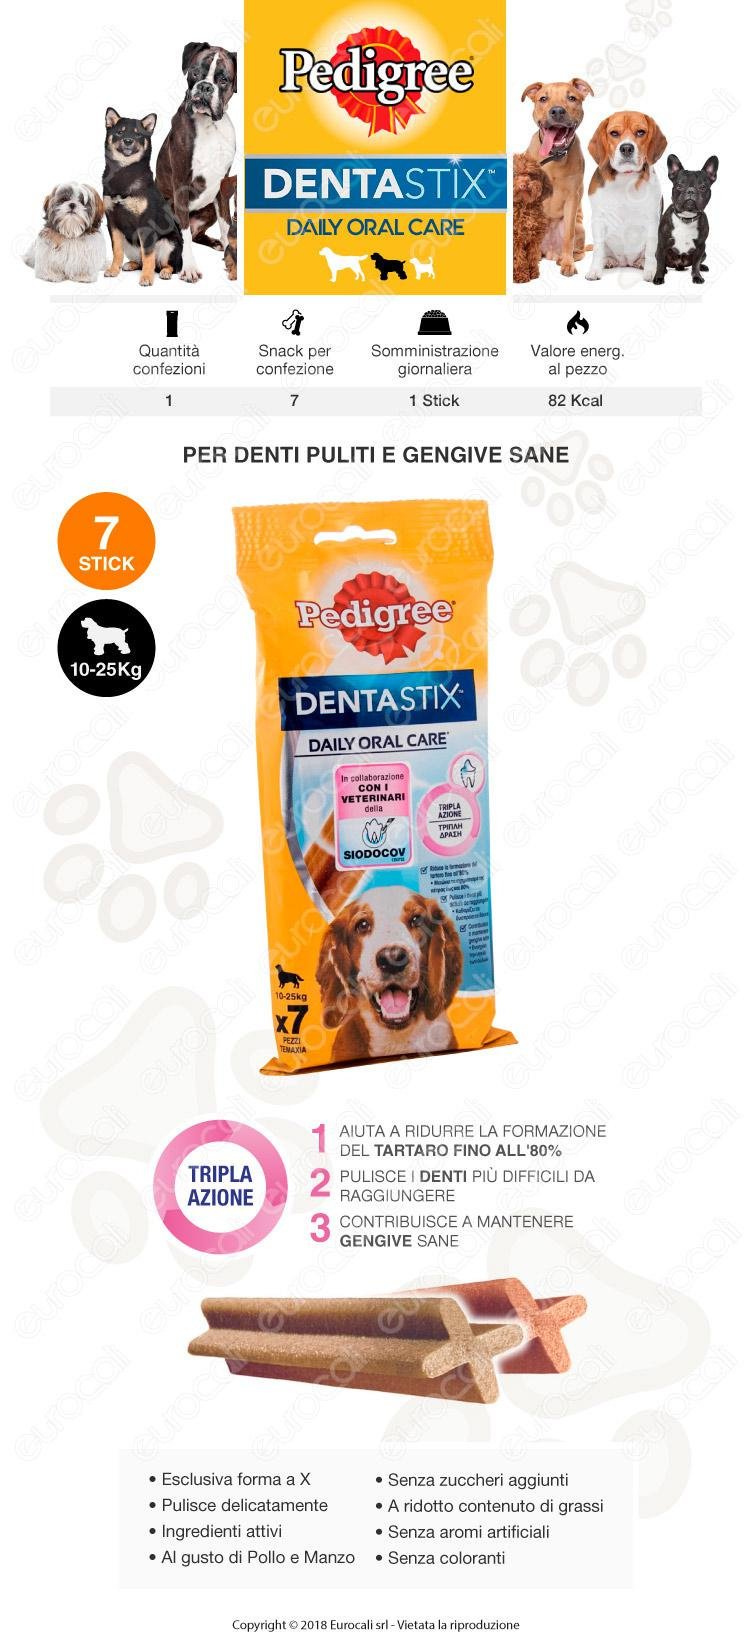 Pedigree Dentastix Medium per l'igiene orale del cane - Confezione da 7 Stick